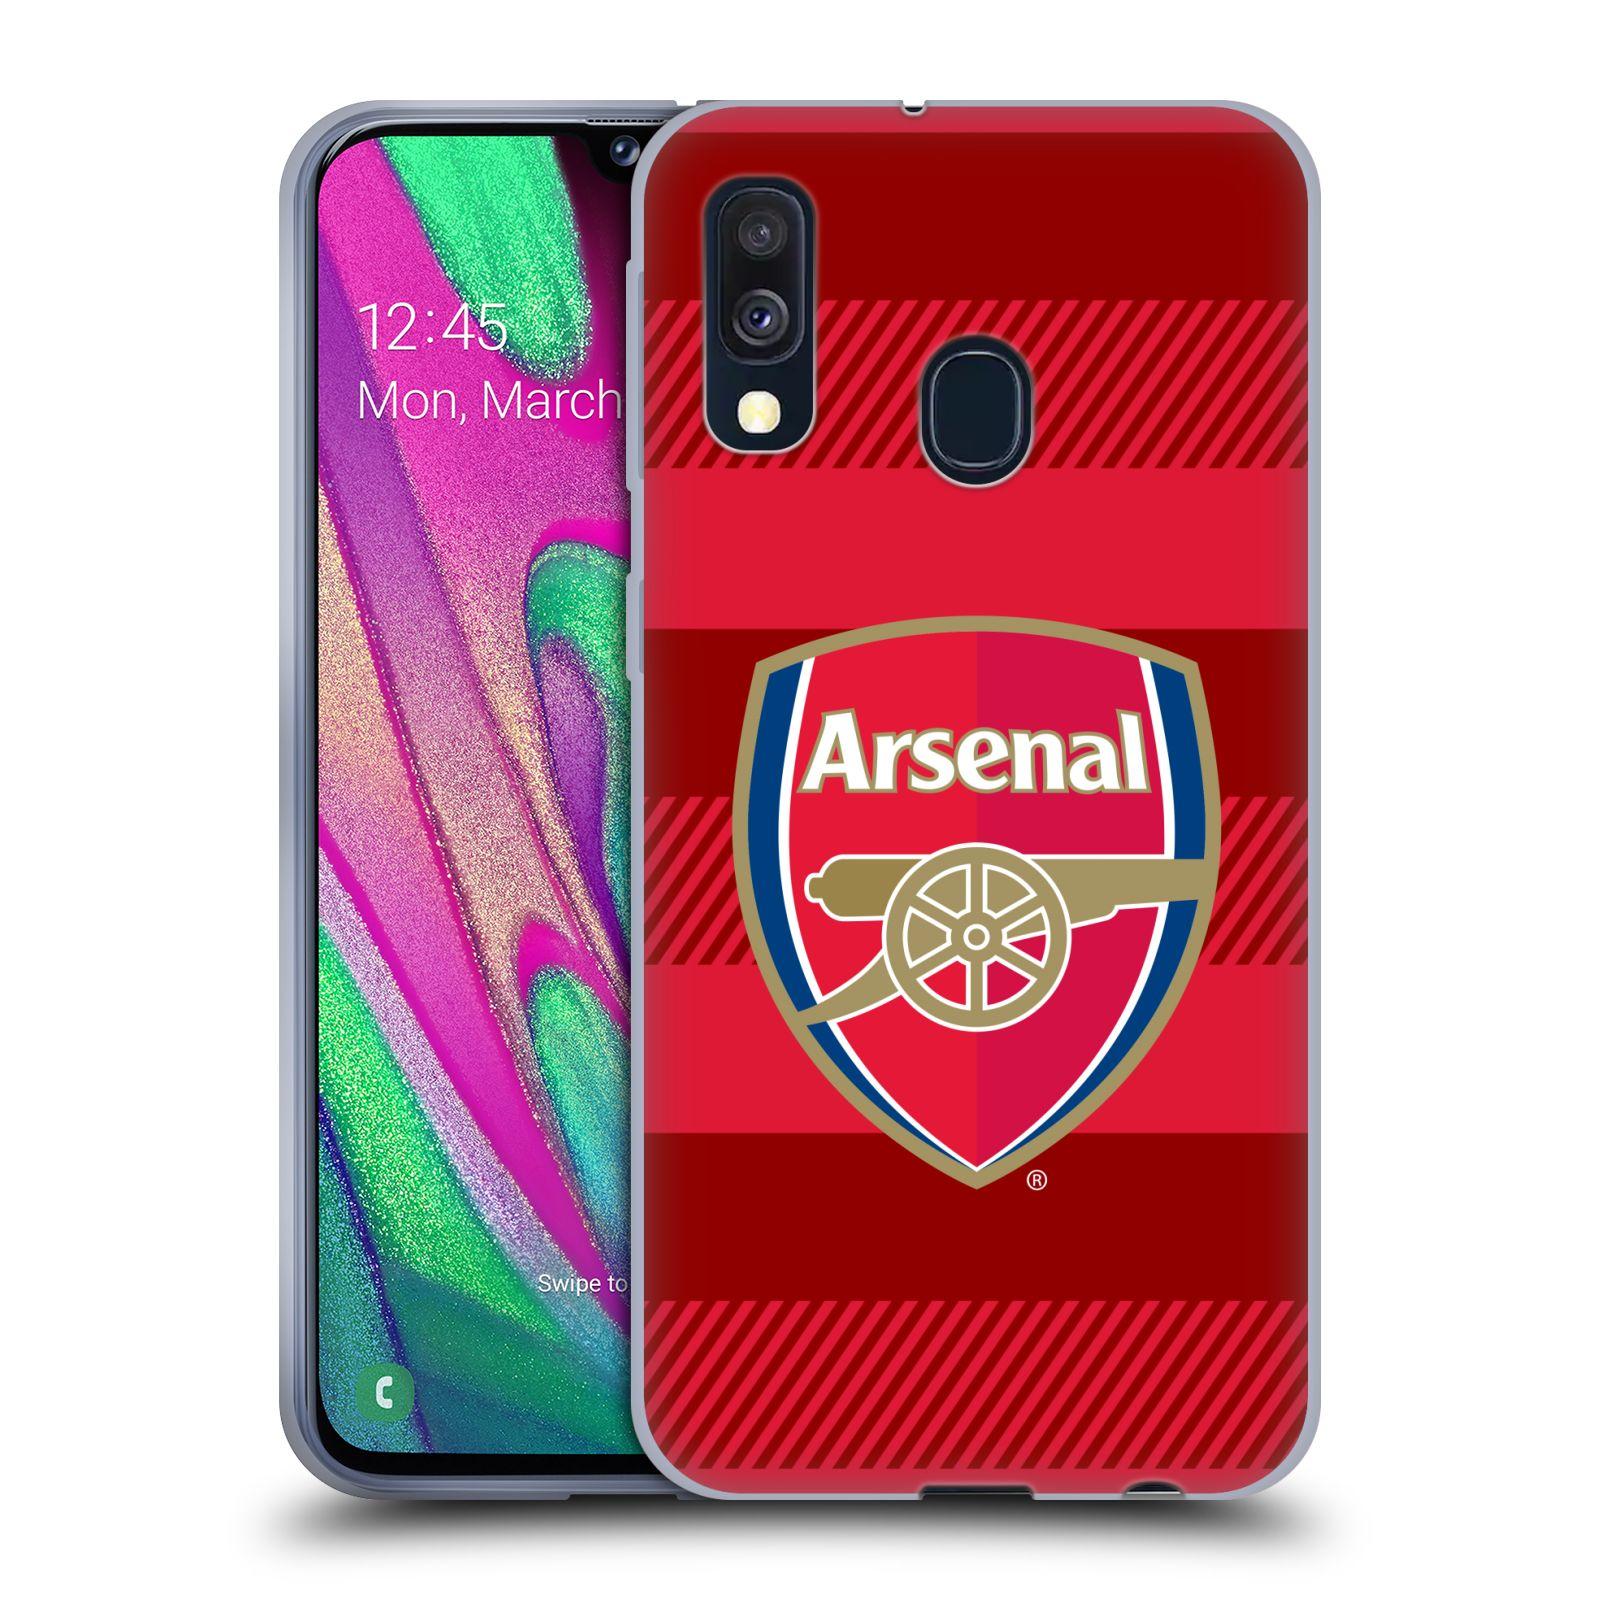 Silikonové pouzdro na mobil Samsung Galaxy A40 - Head Case - Arsenal FC - Logo s pruhy